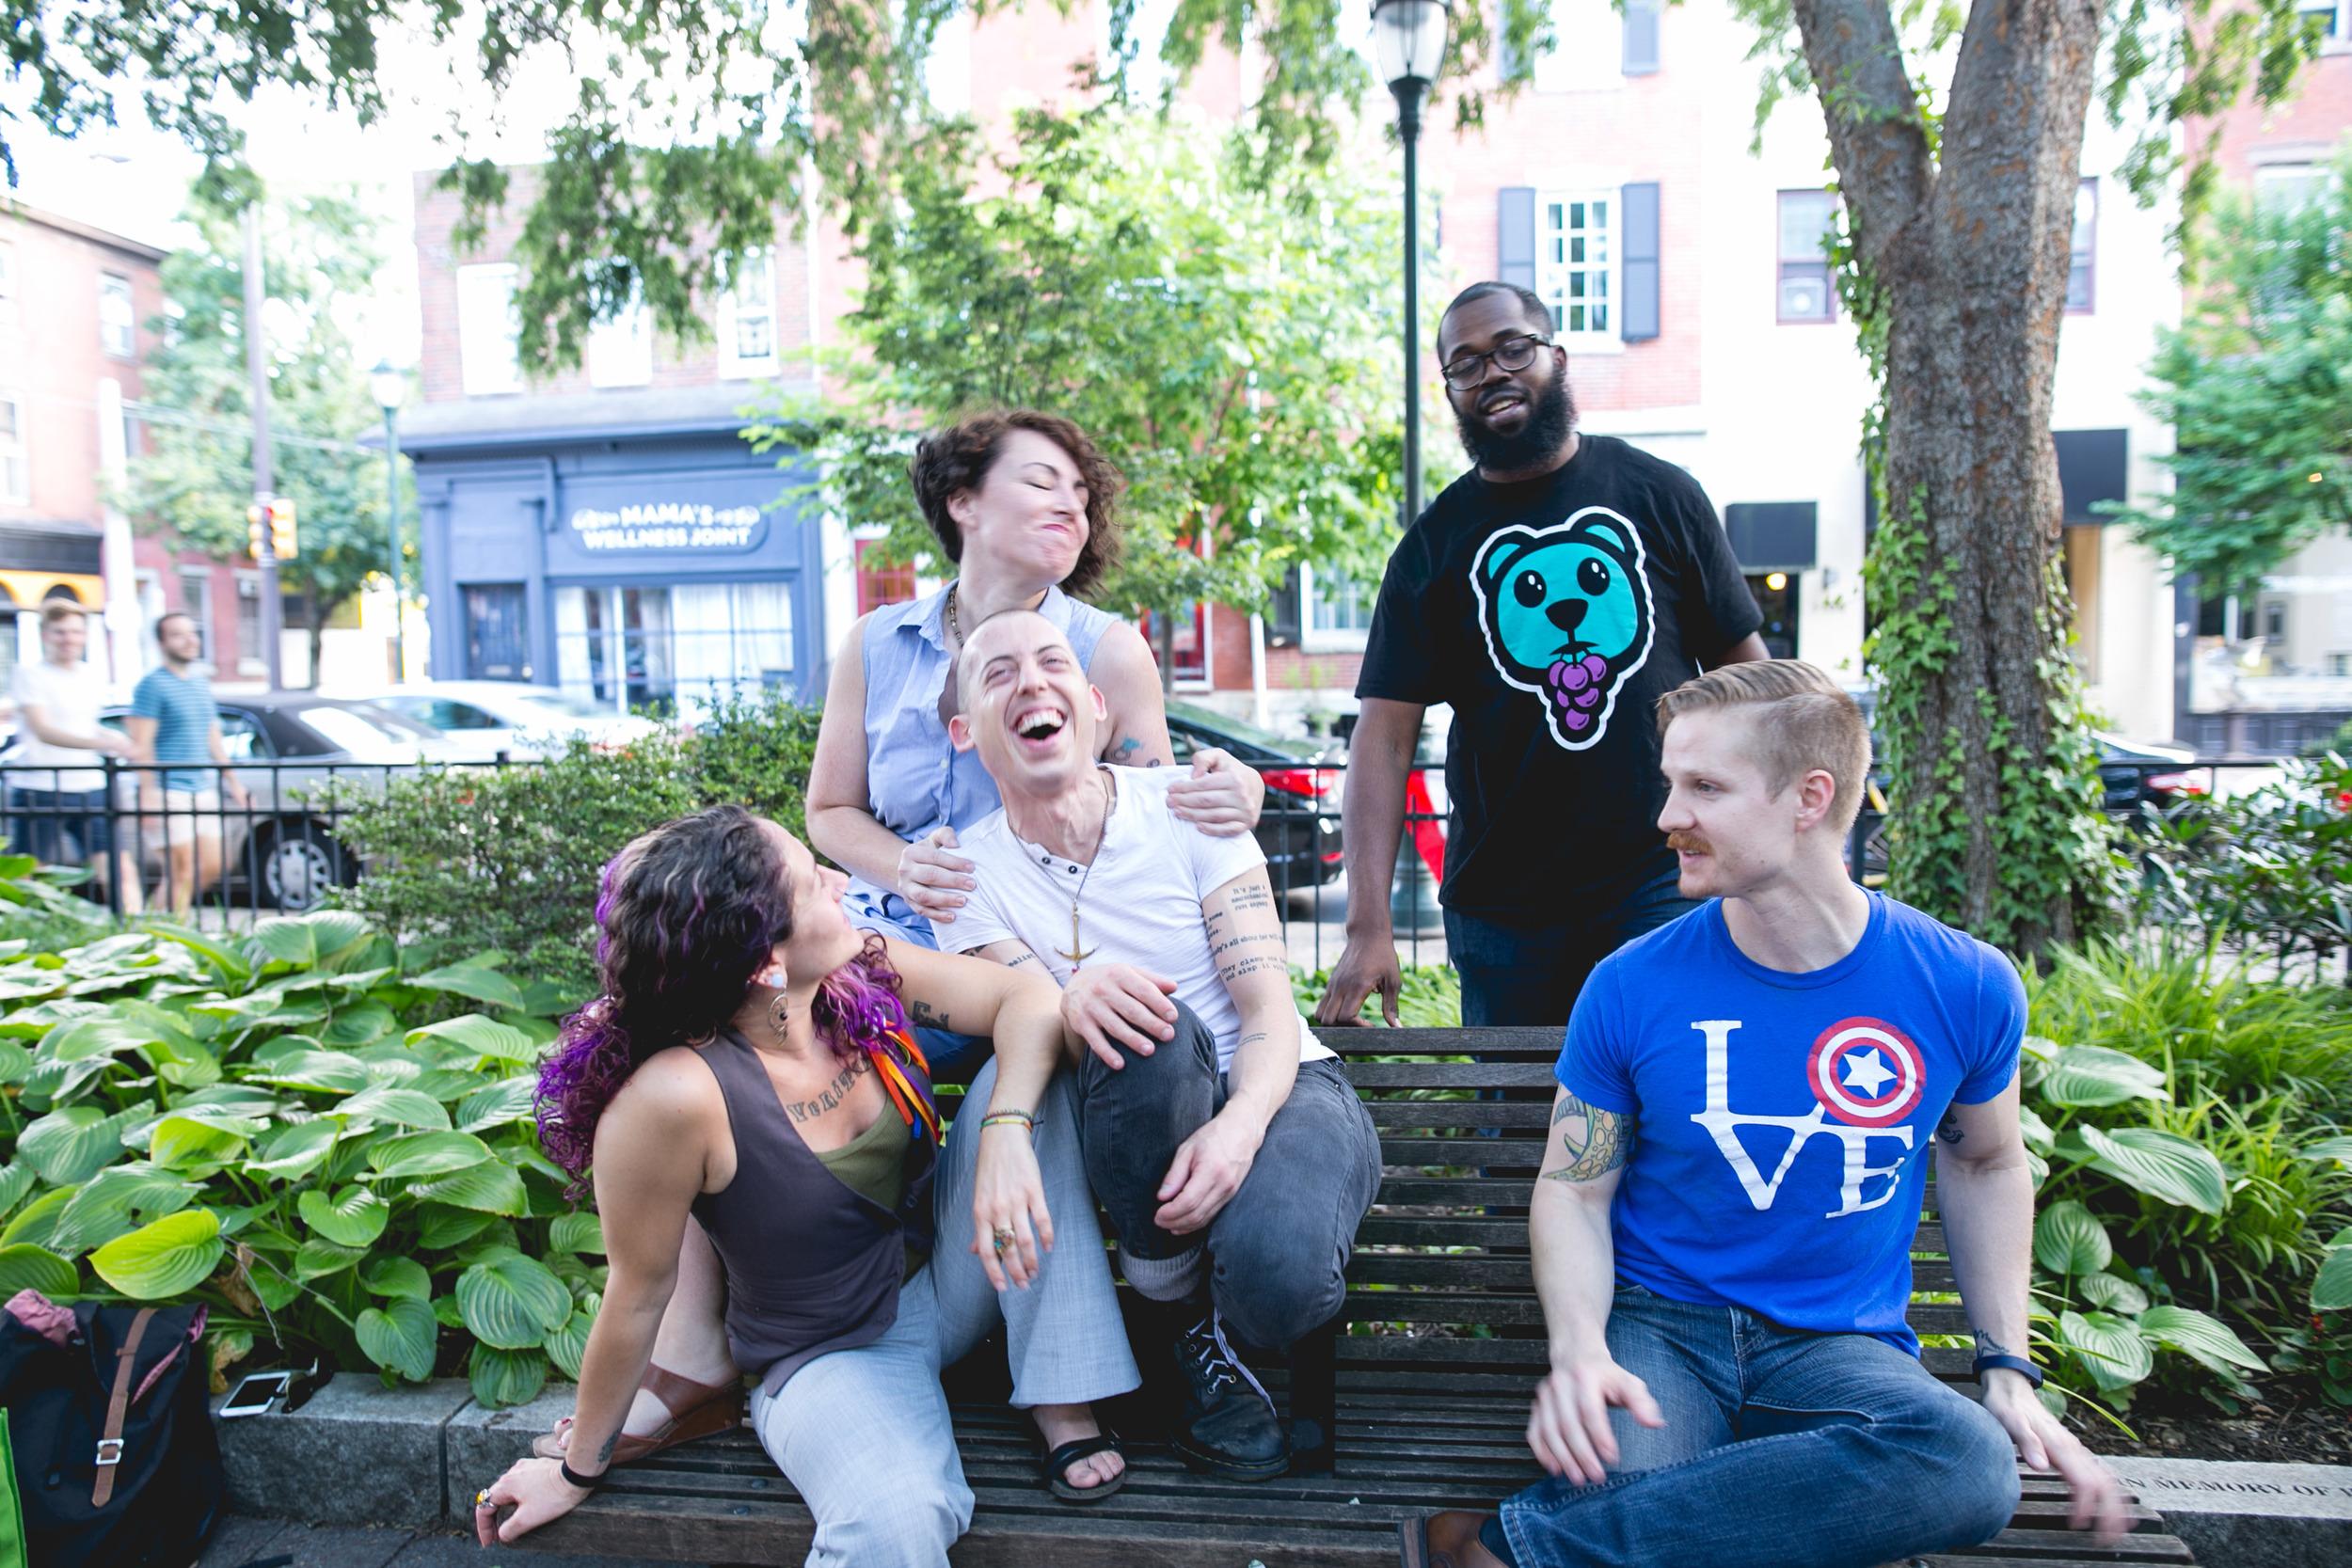 Philadelphia Weekly Forward Philly Headshots by LGBTQ photographer